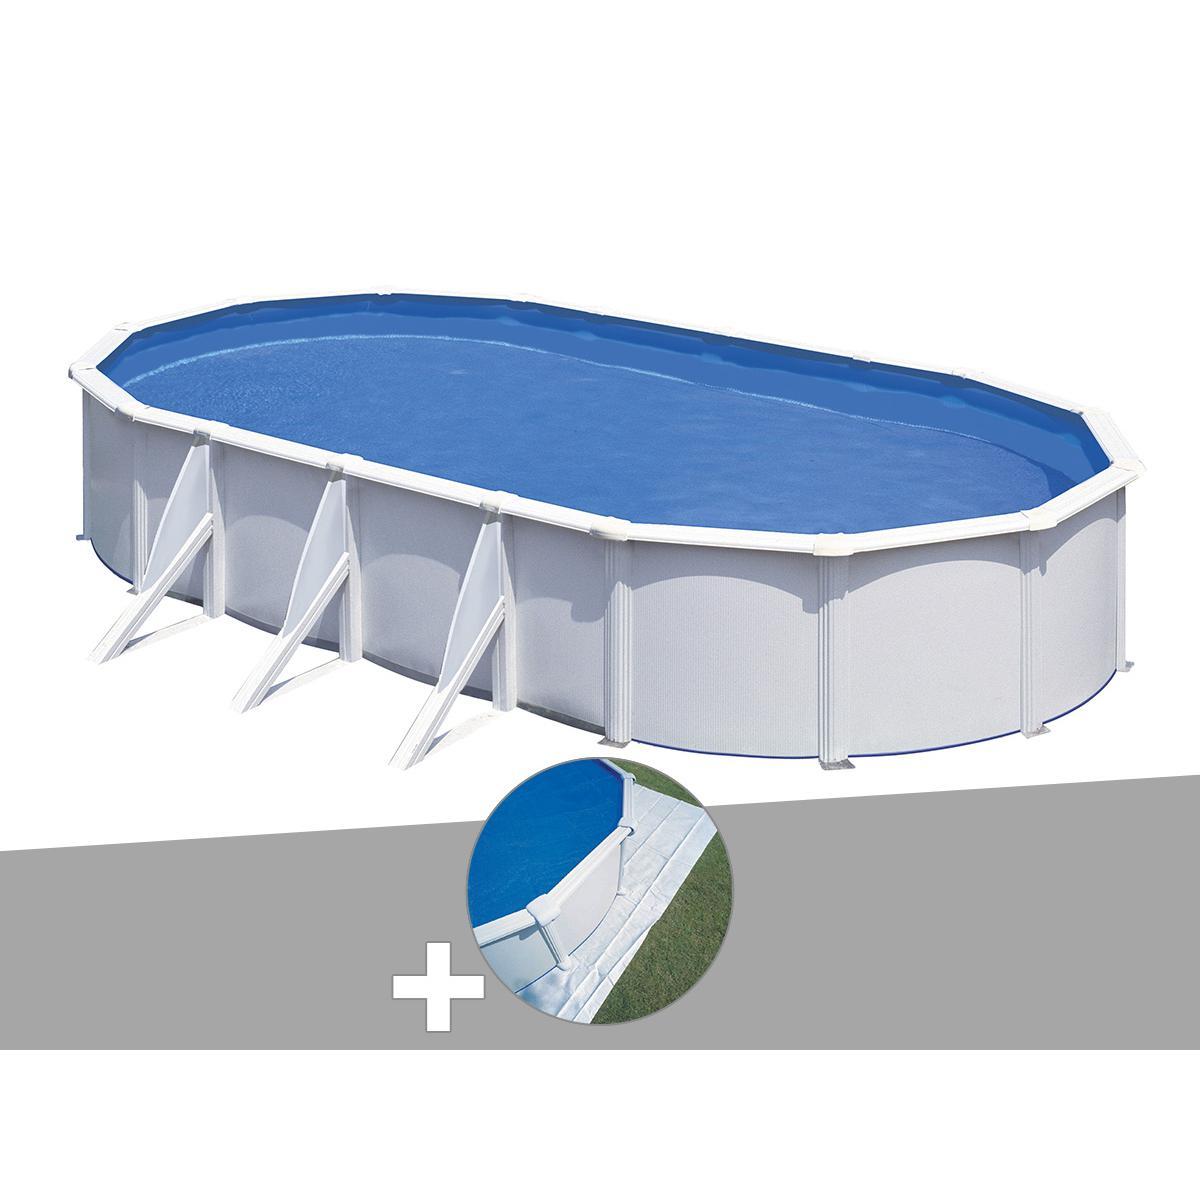 Gre Kit piscine acier blanc Gré Fidji ovale 5,27 x 3,27 x 1,22 m + Tapis de sol